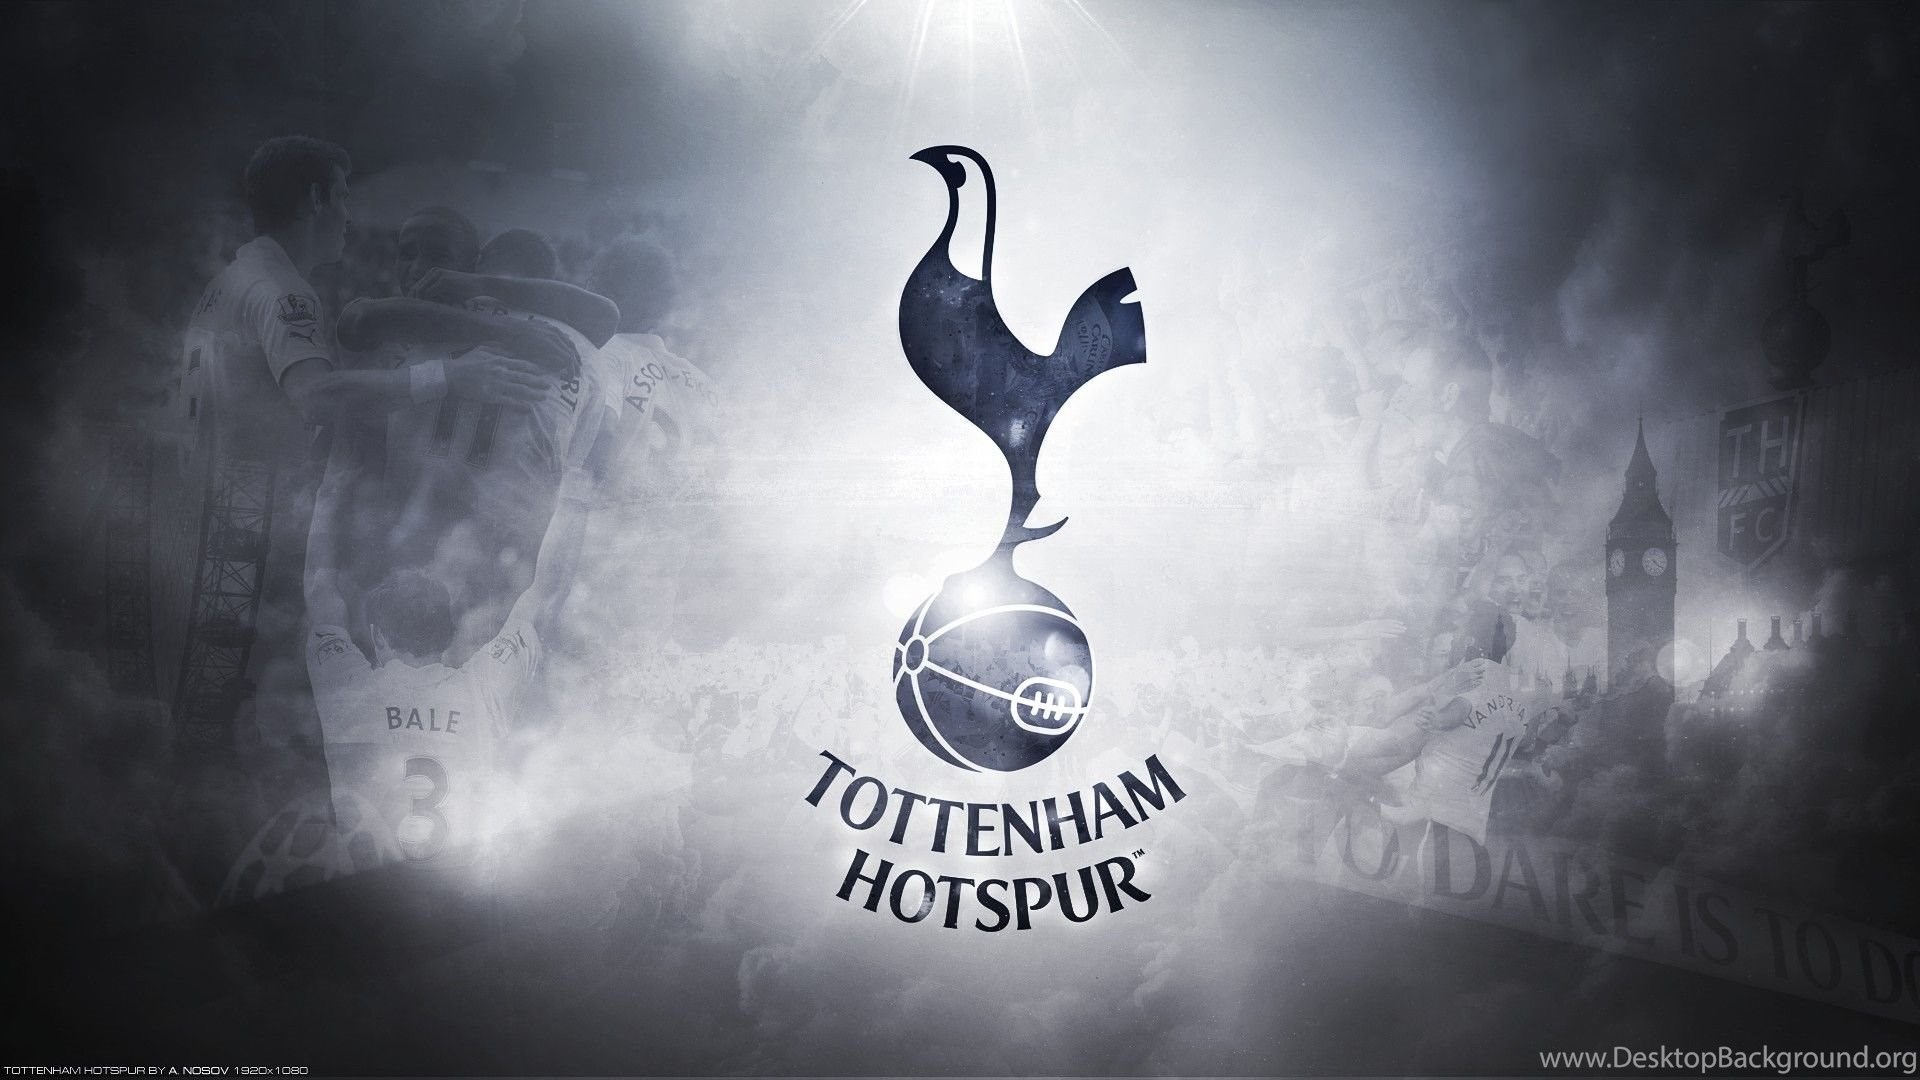 Tottenham Hotspur FC Wallpapers And Windows 10 Theme